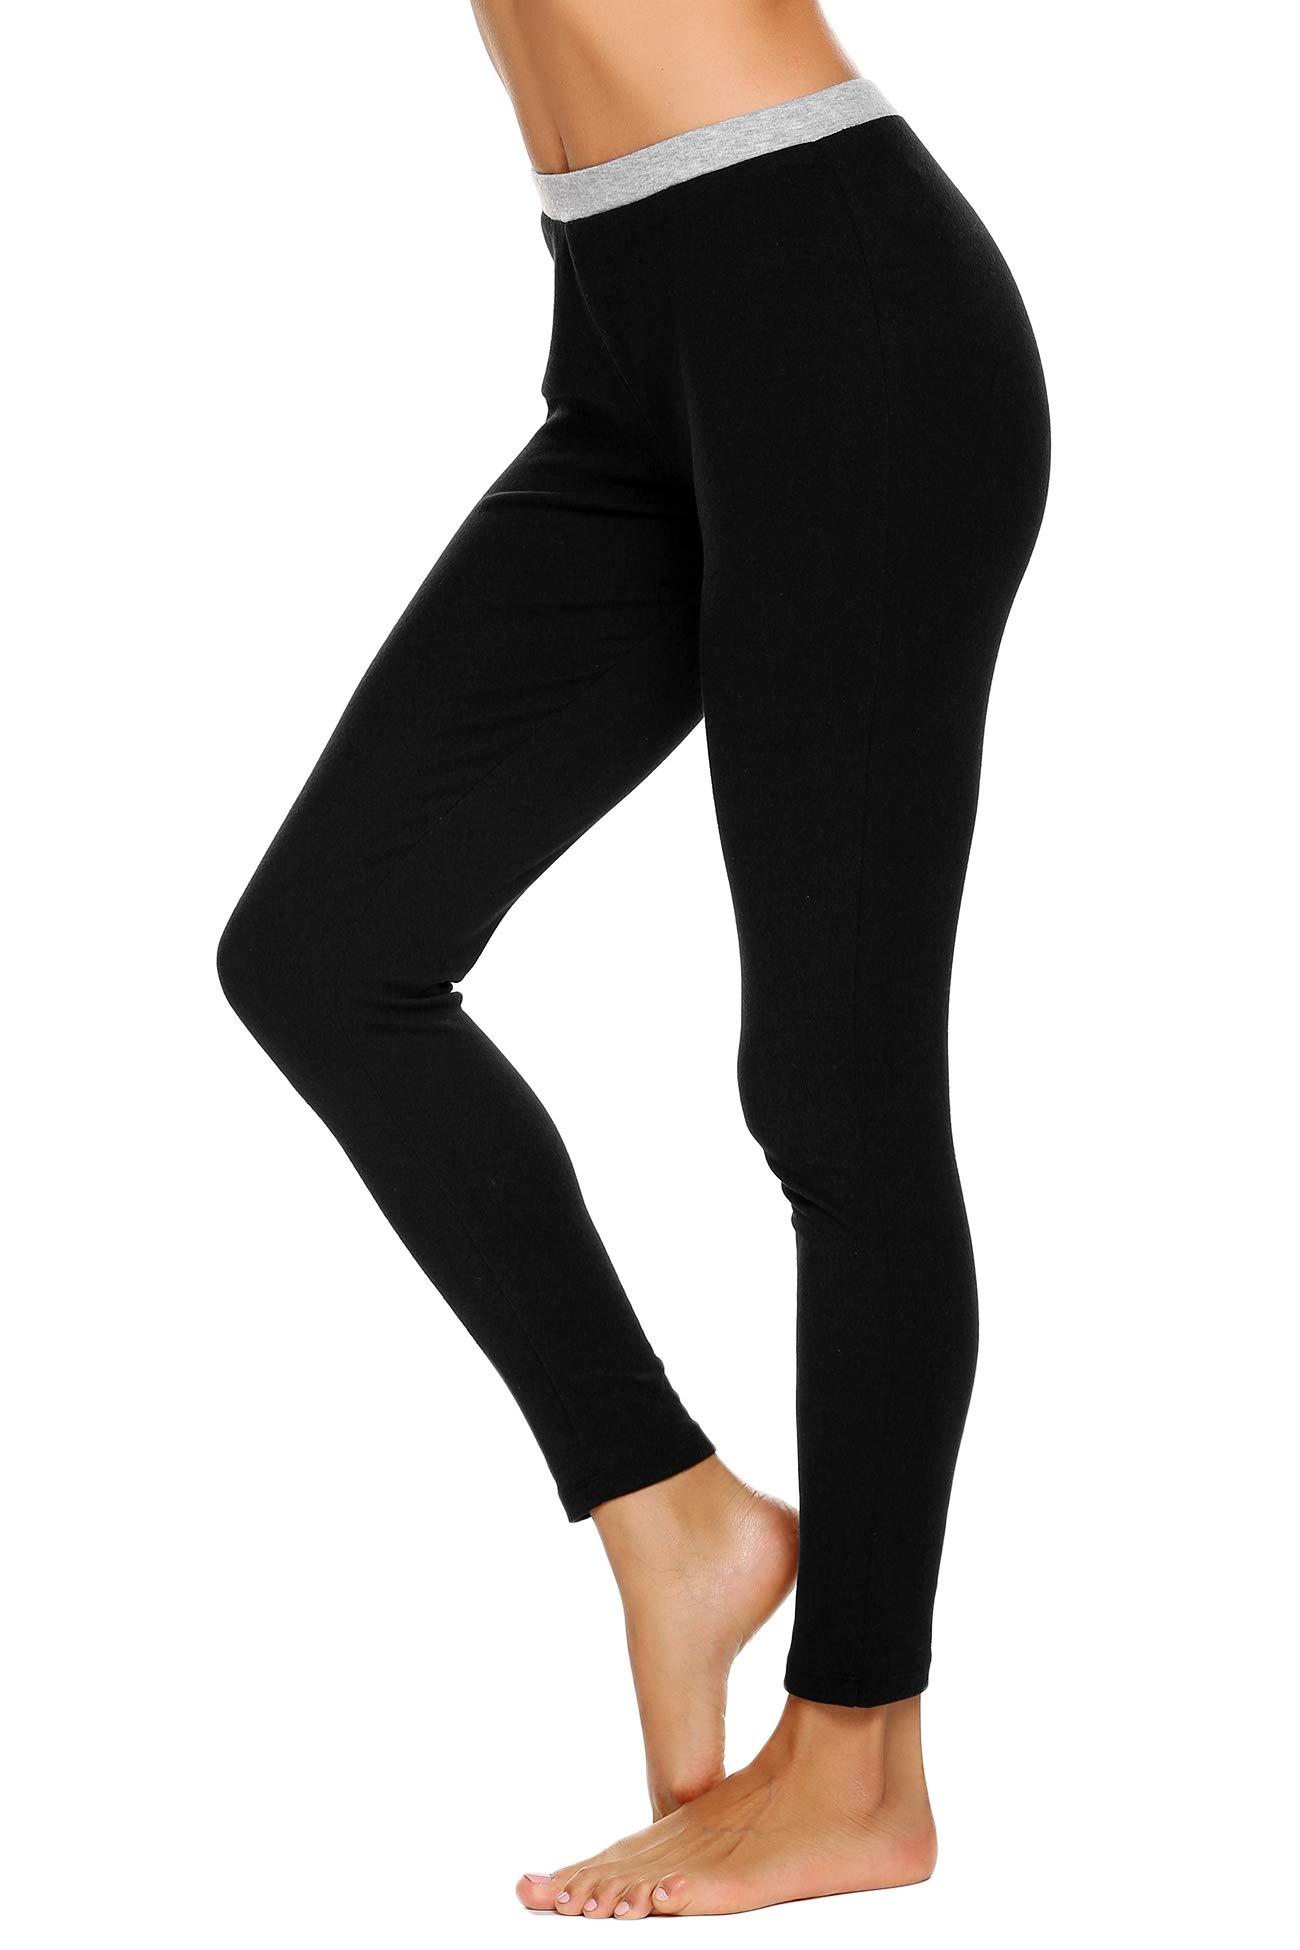 Ekouaer Women's Thermal Pants Underwear Bottoms Base Layer Legging (Black S)